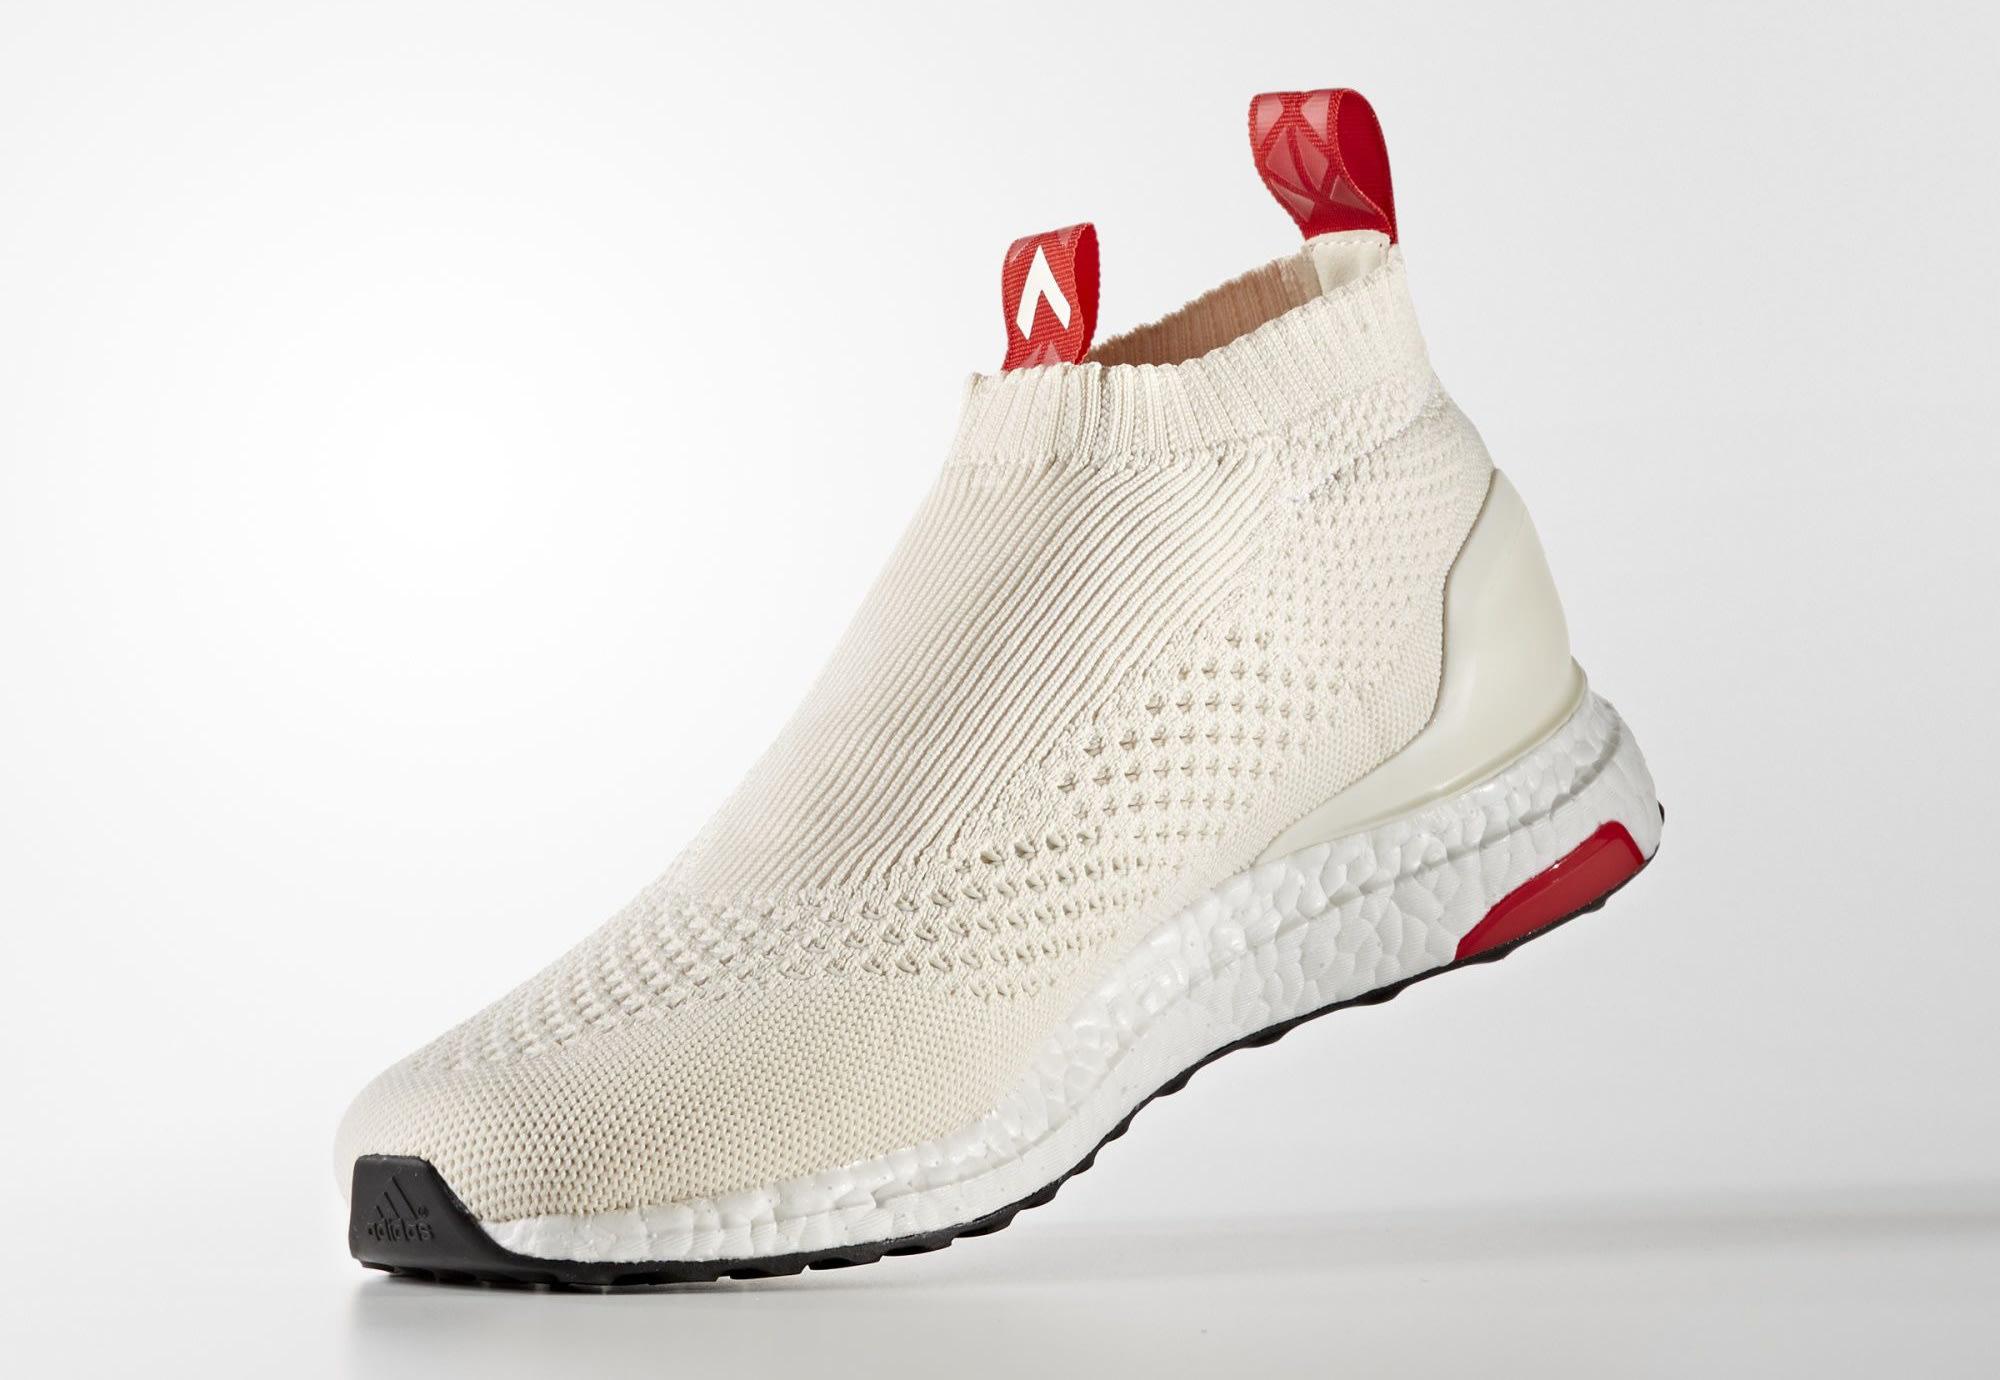 david beckham yeezy ultra boost white adidas store website